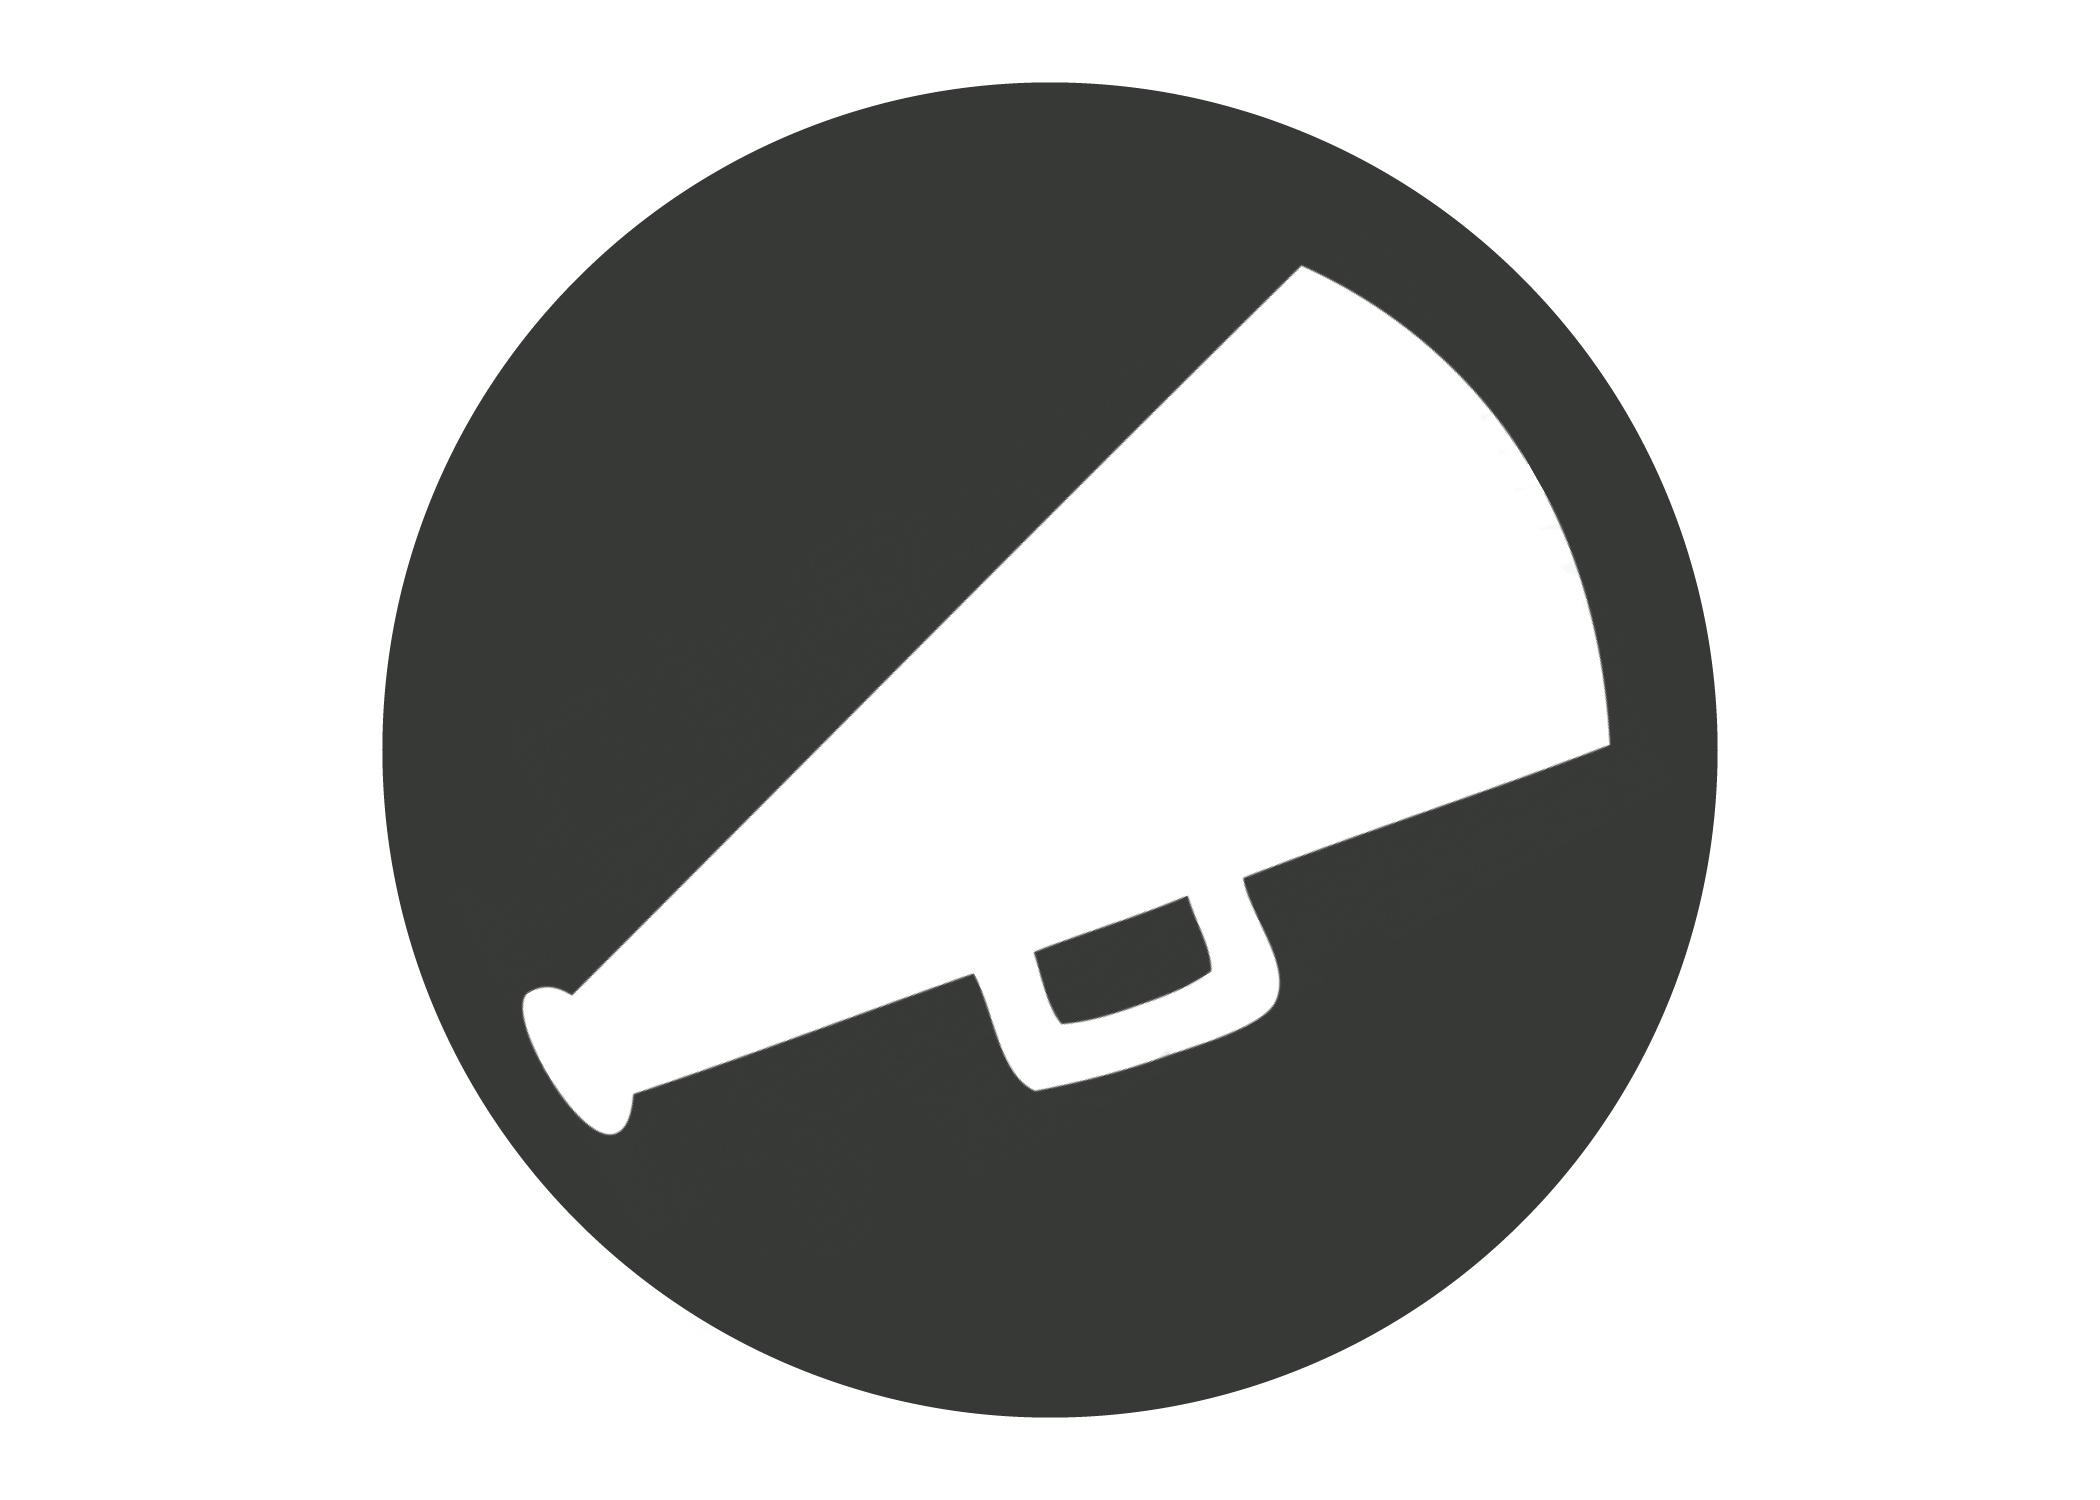 icon-mini.jpg